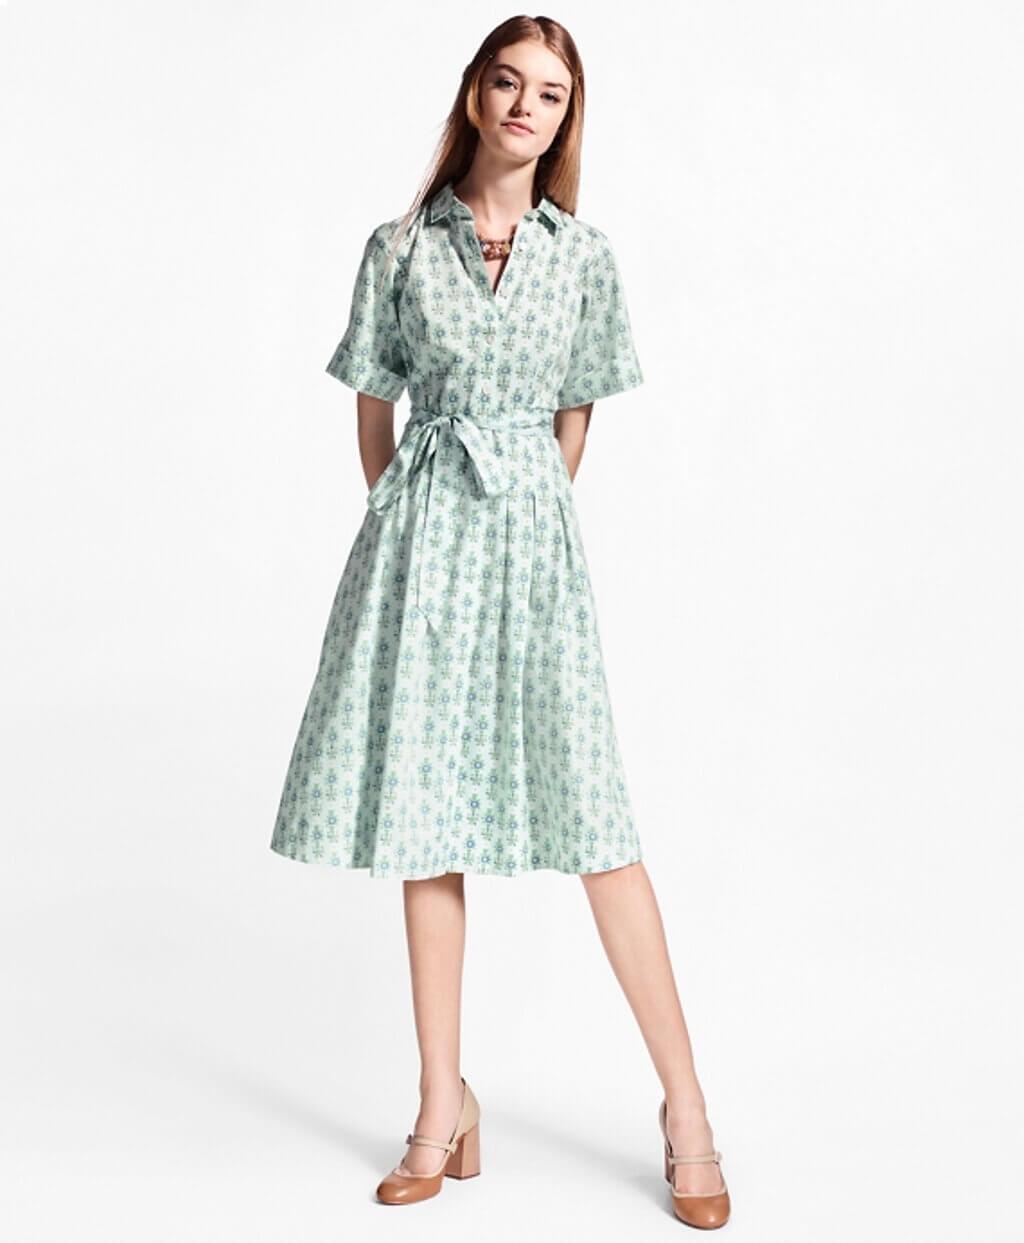 HERO - WX00448_LIGHT-BLUE-MULTI - Σεμιζιέ Φλοράλ Φόρεμα από Βαμβακερό Σατέν - 100097302 - 230